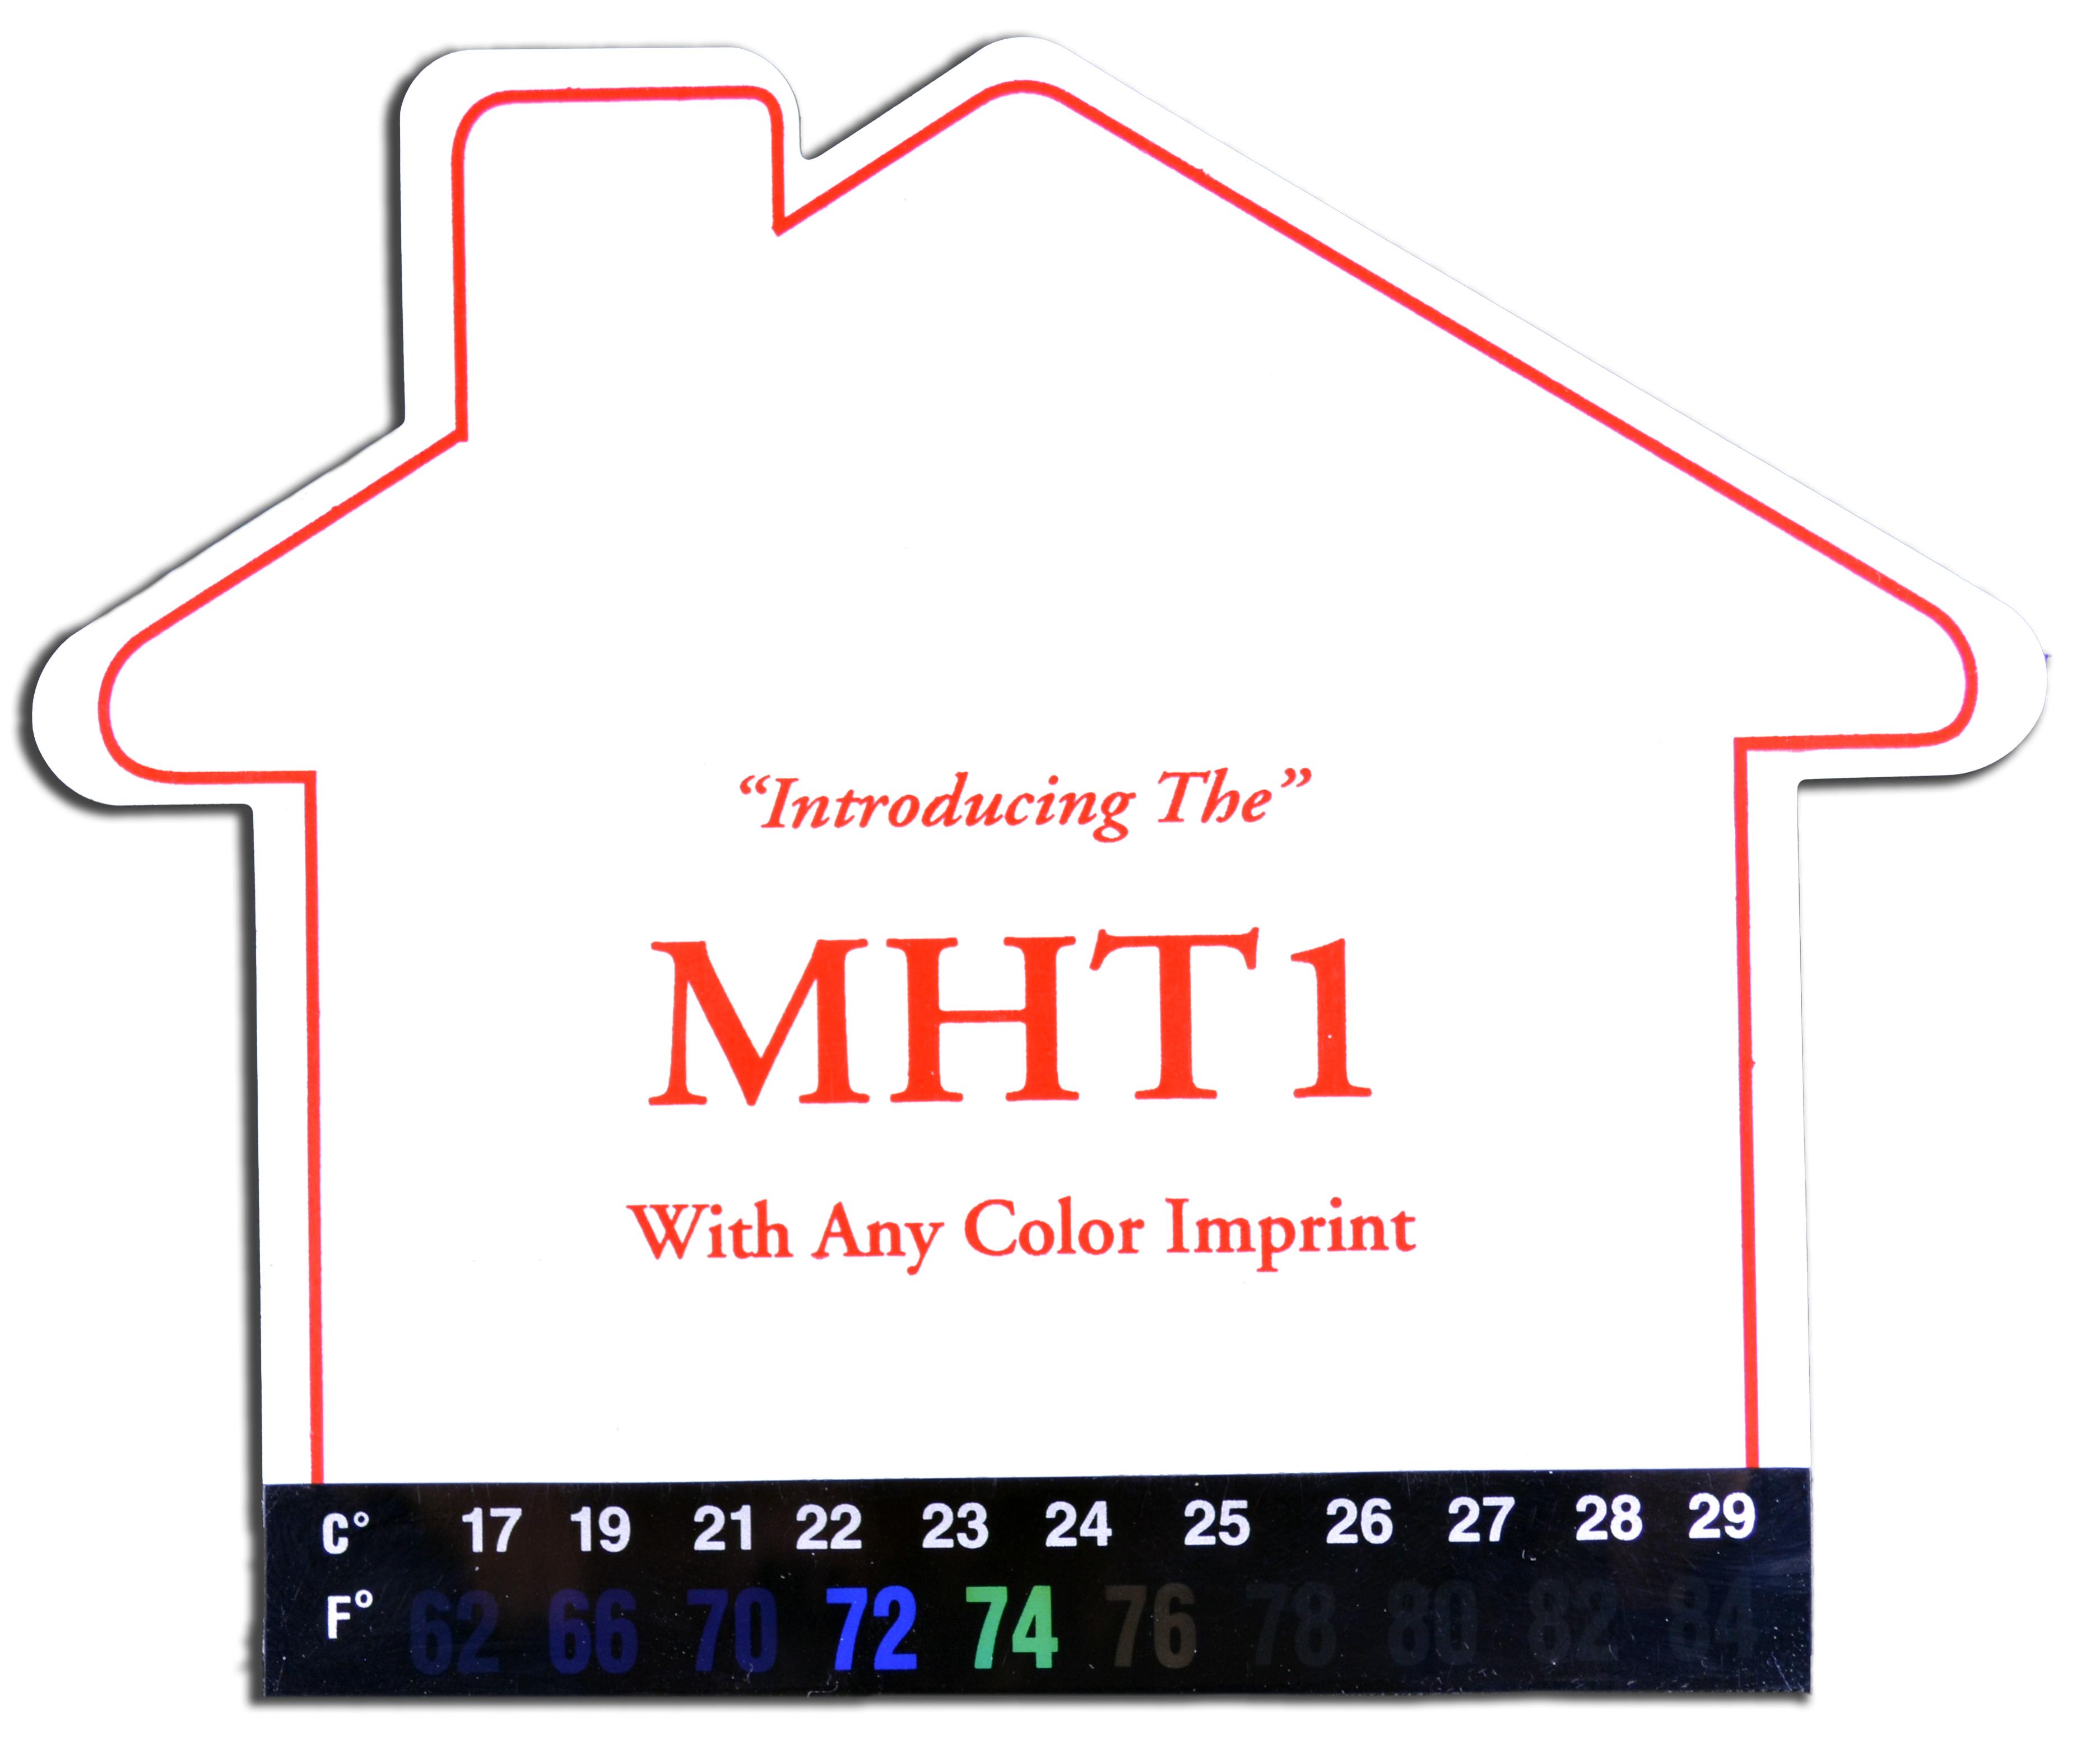 MHT1 Image